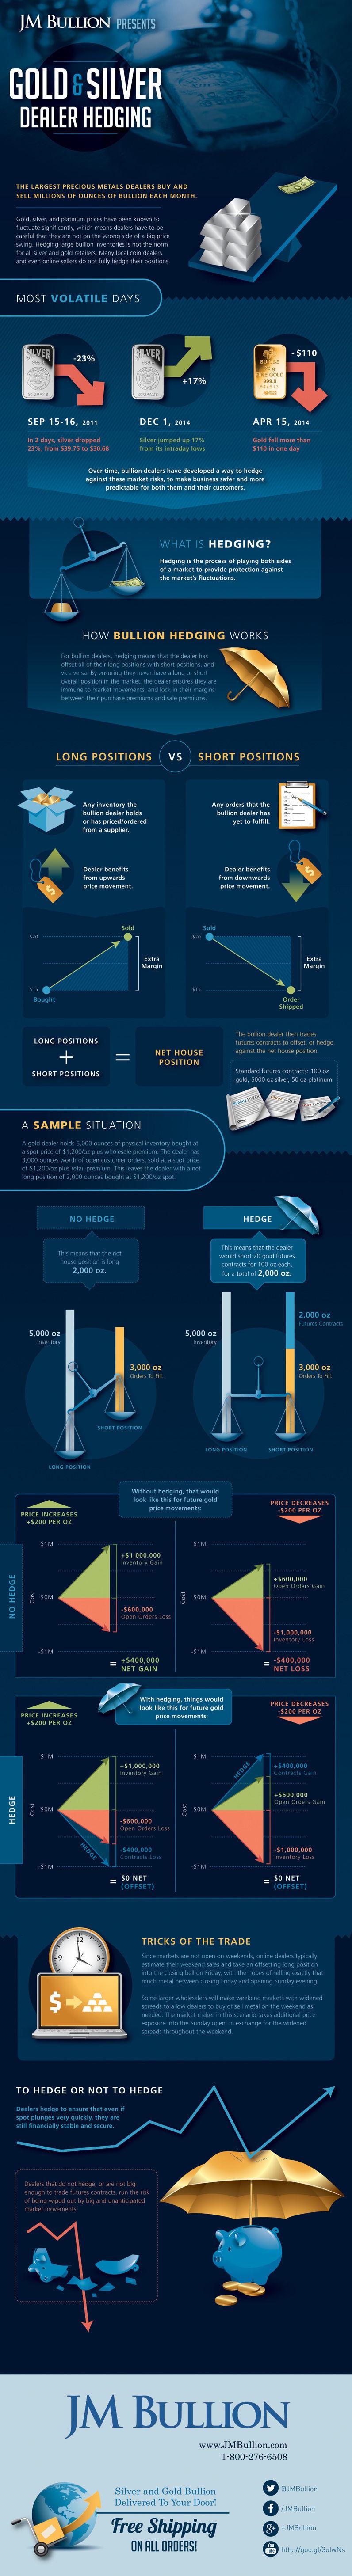 How Bullion Dealers Hedge Precious Metals (Infographic)